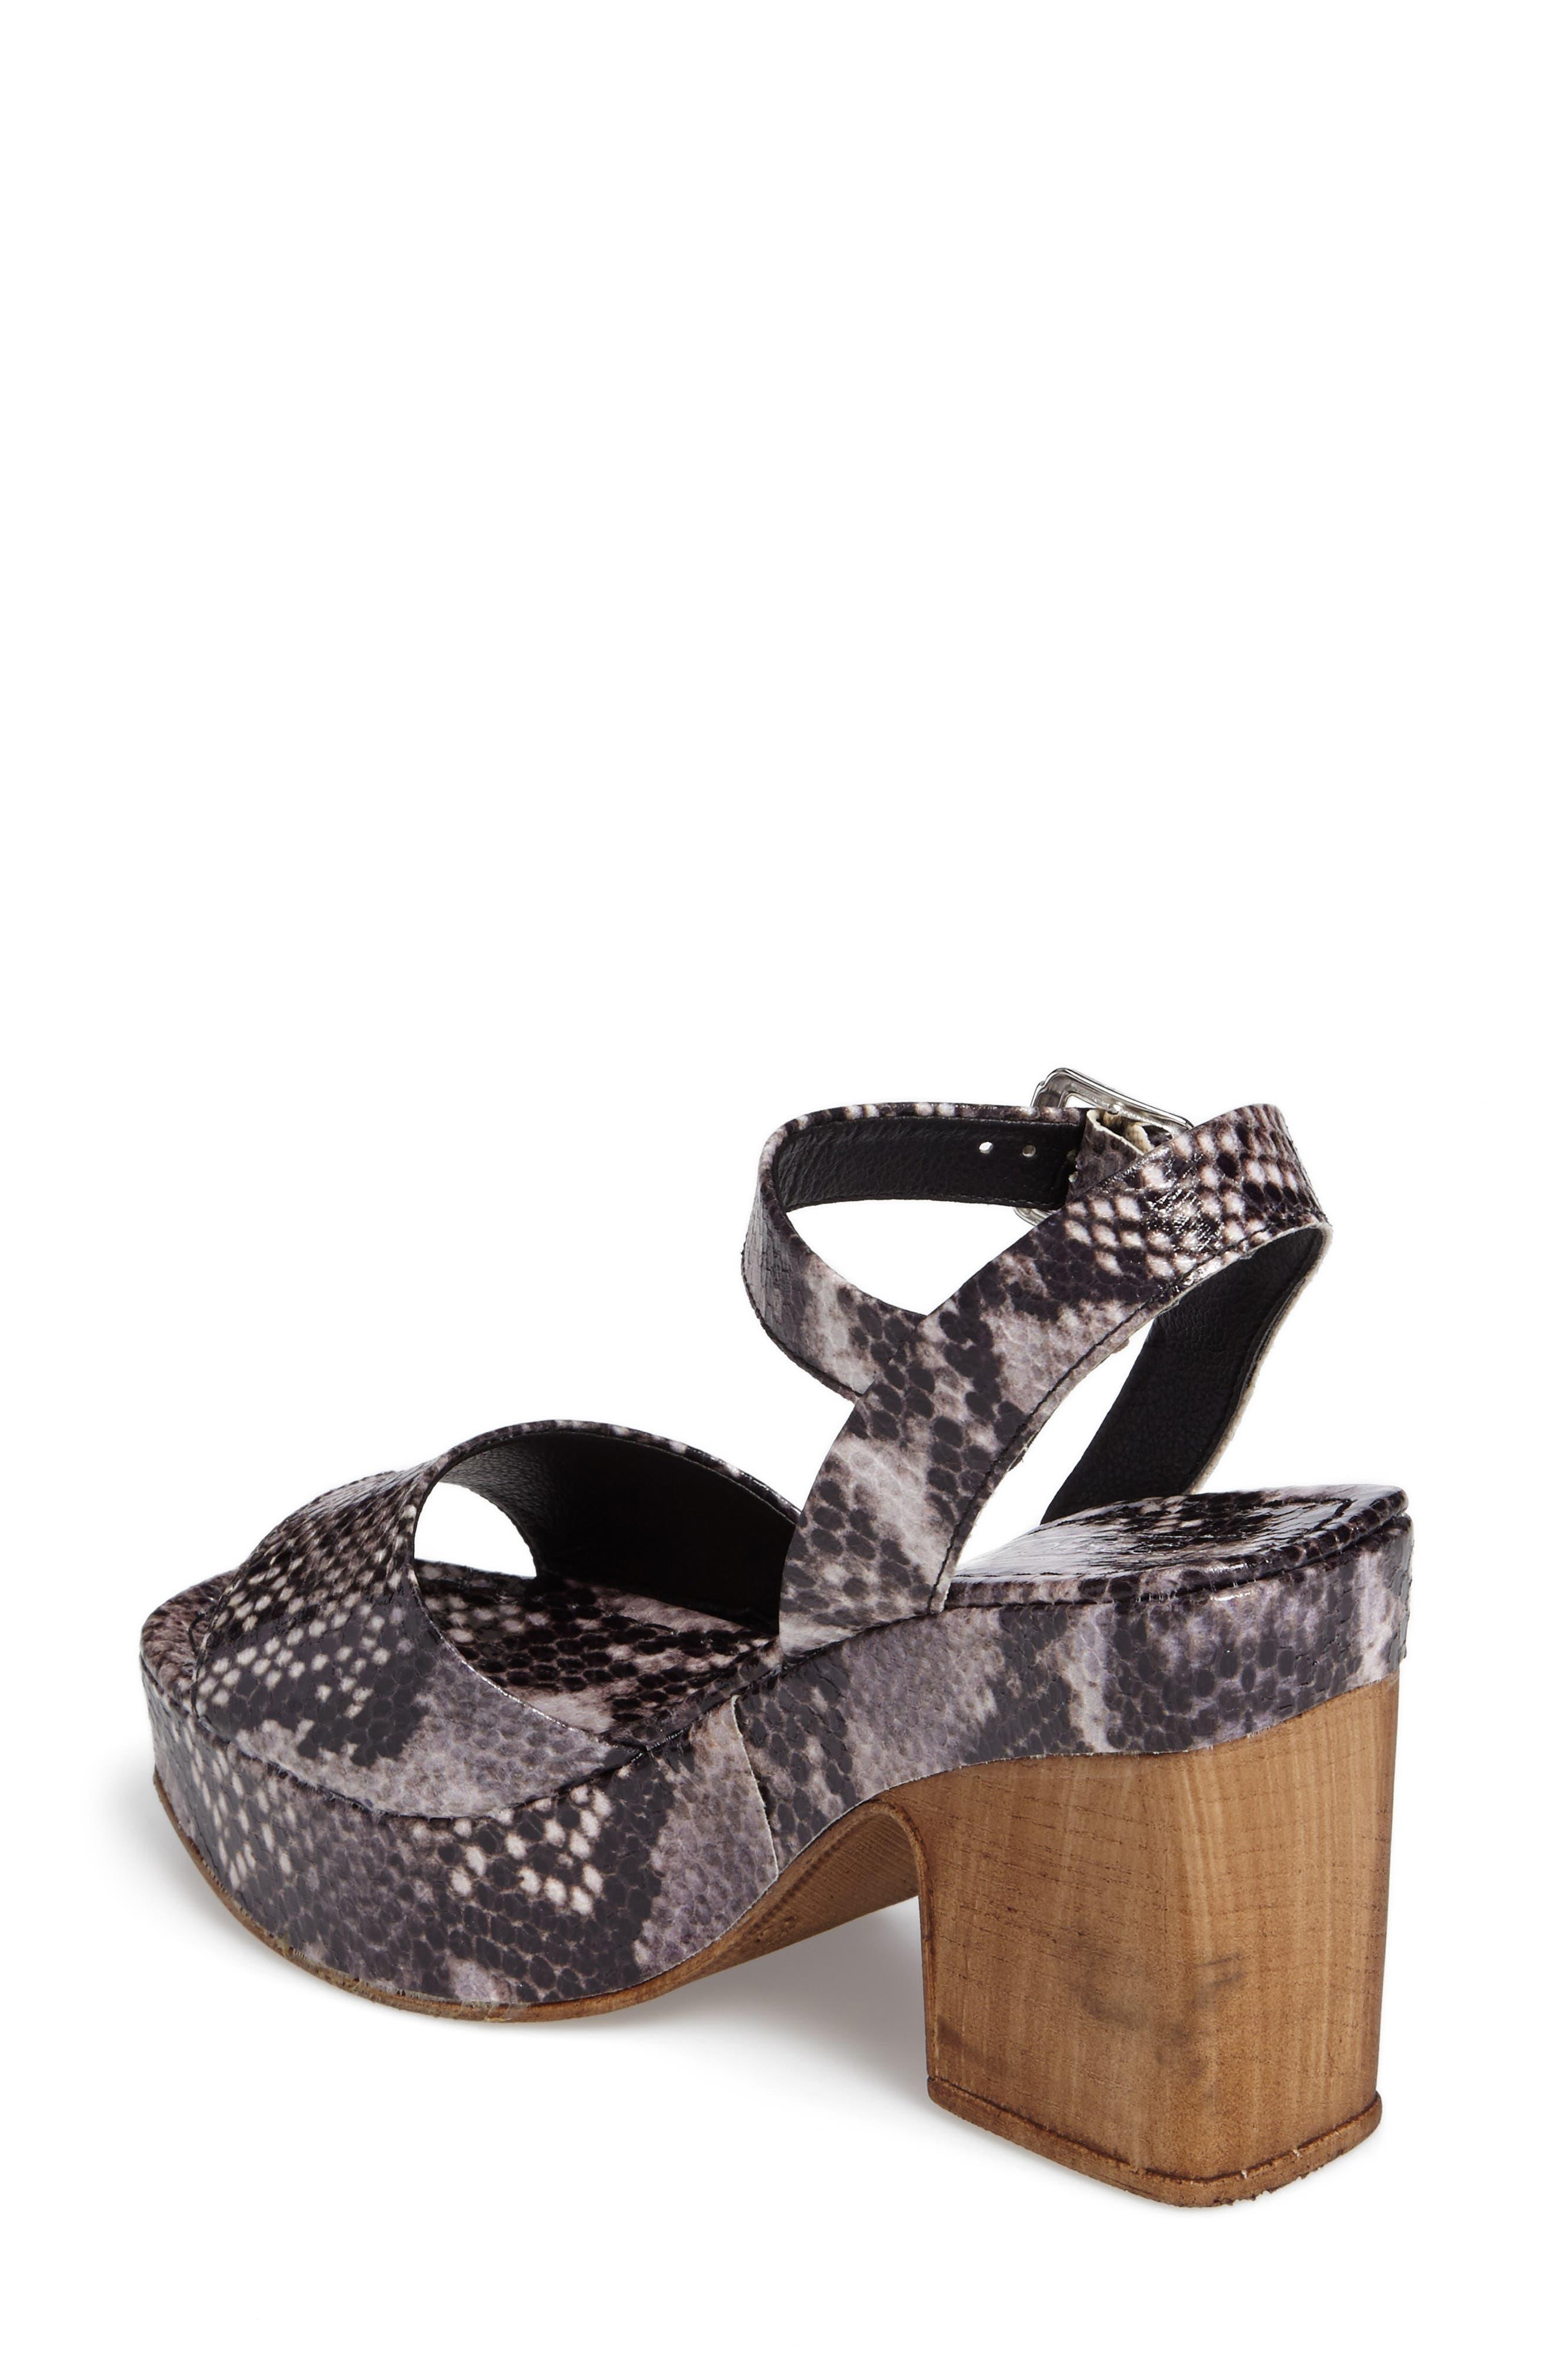 Violets Platform Sandals,                             Alternate thumbnail 5, color,